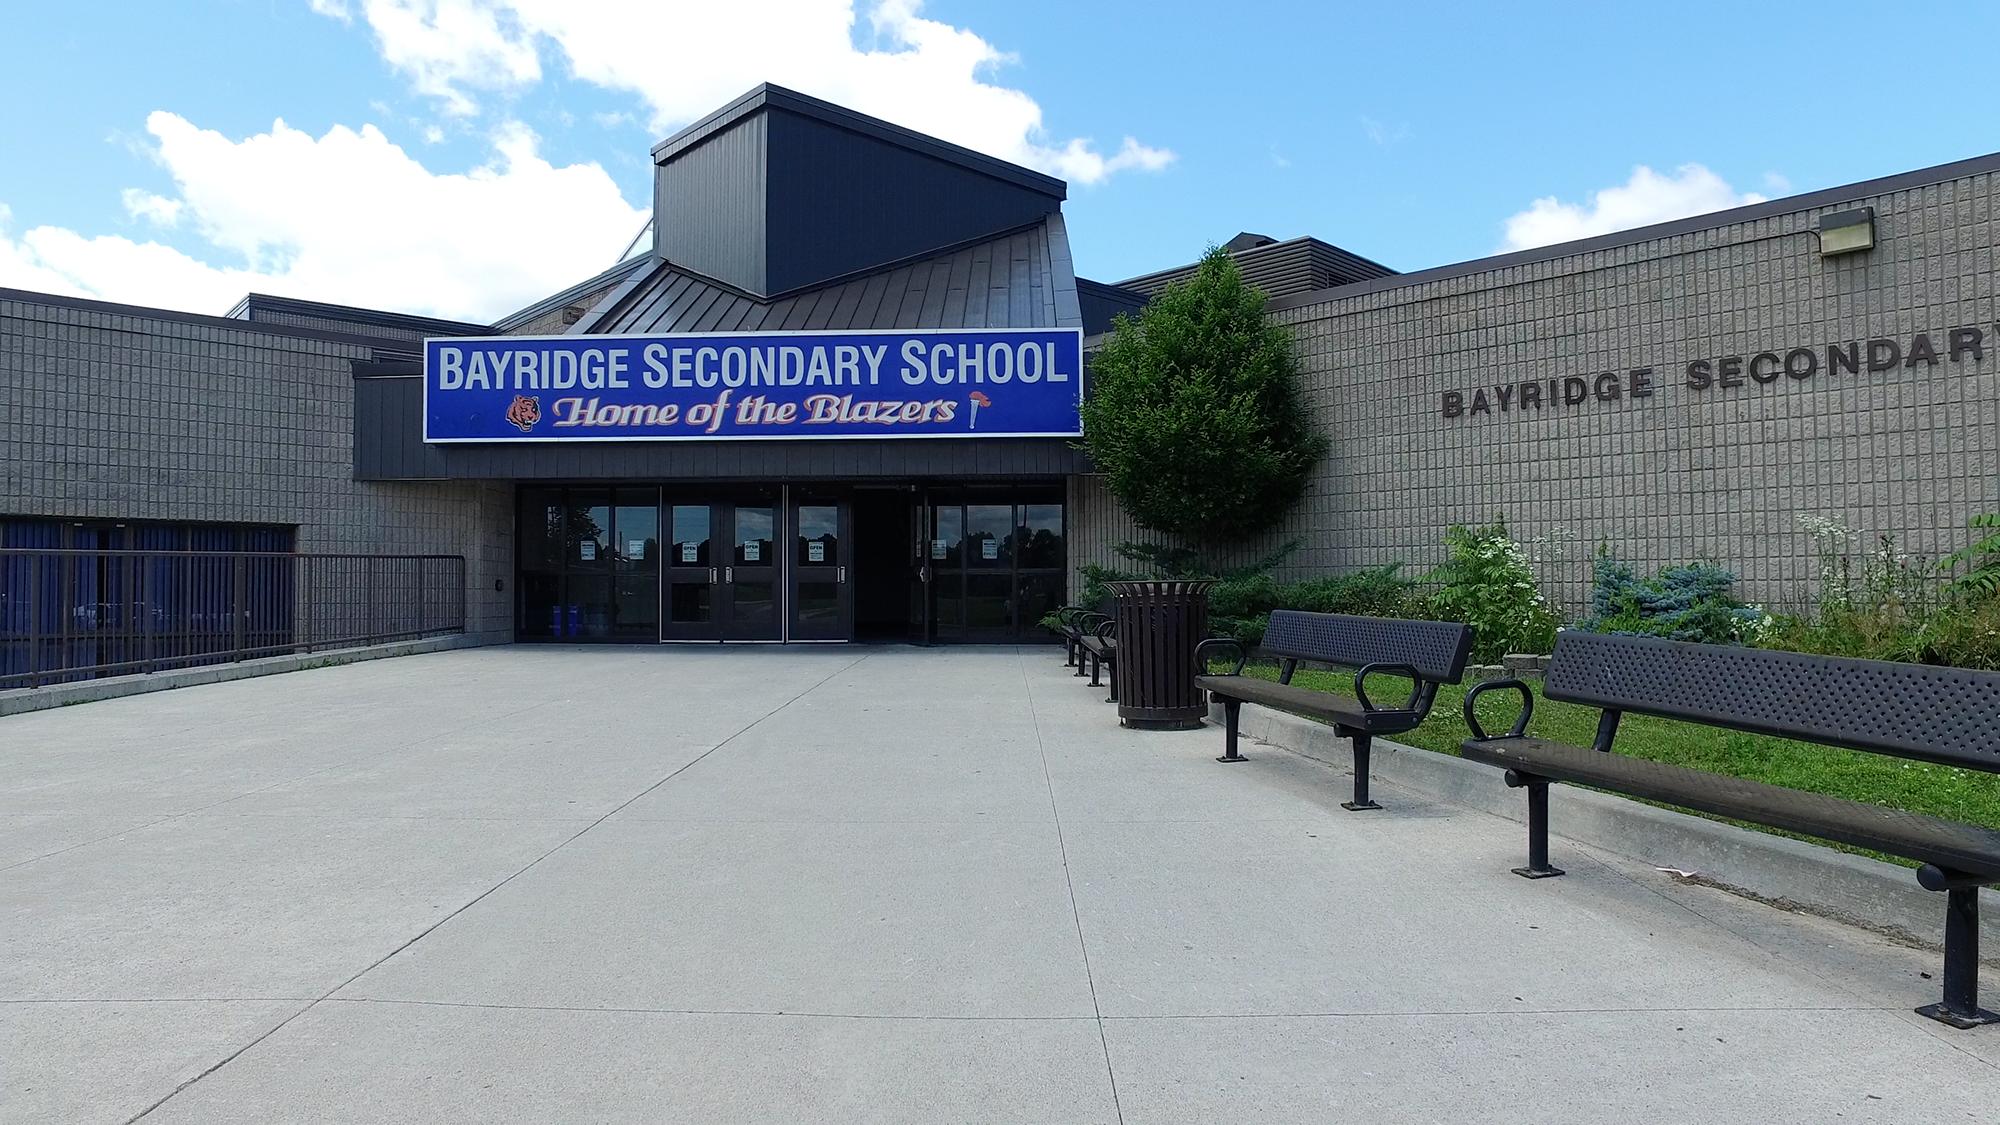 BayridgeSecondarySchoolSS.png